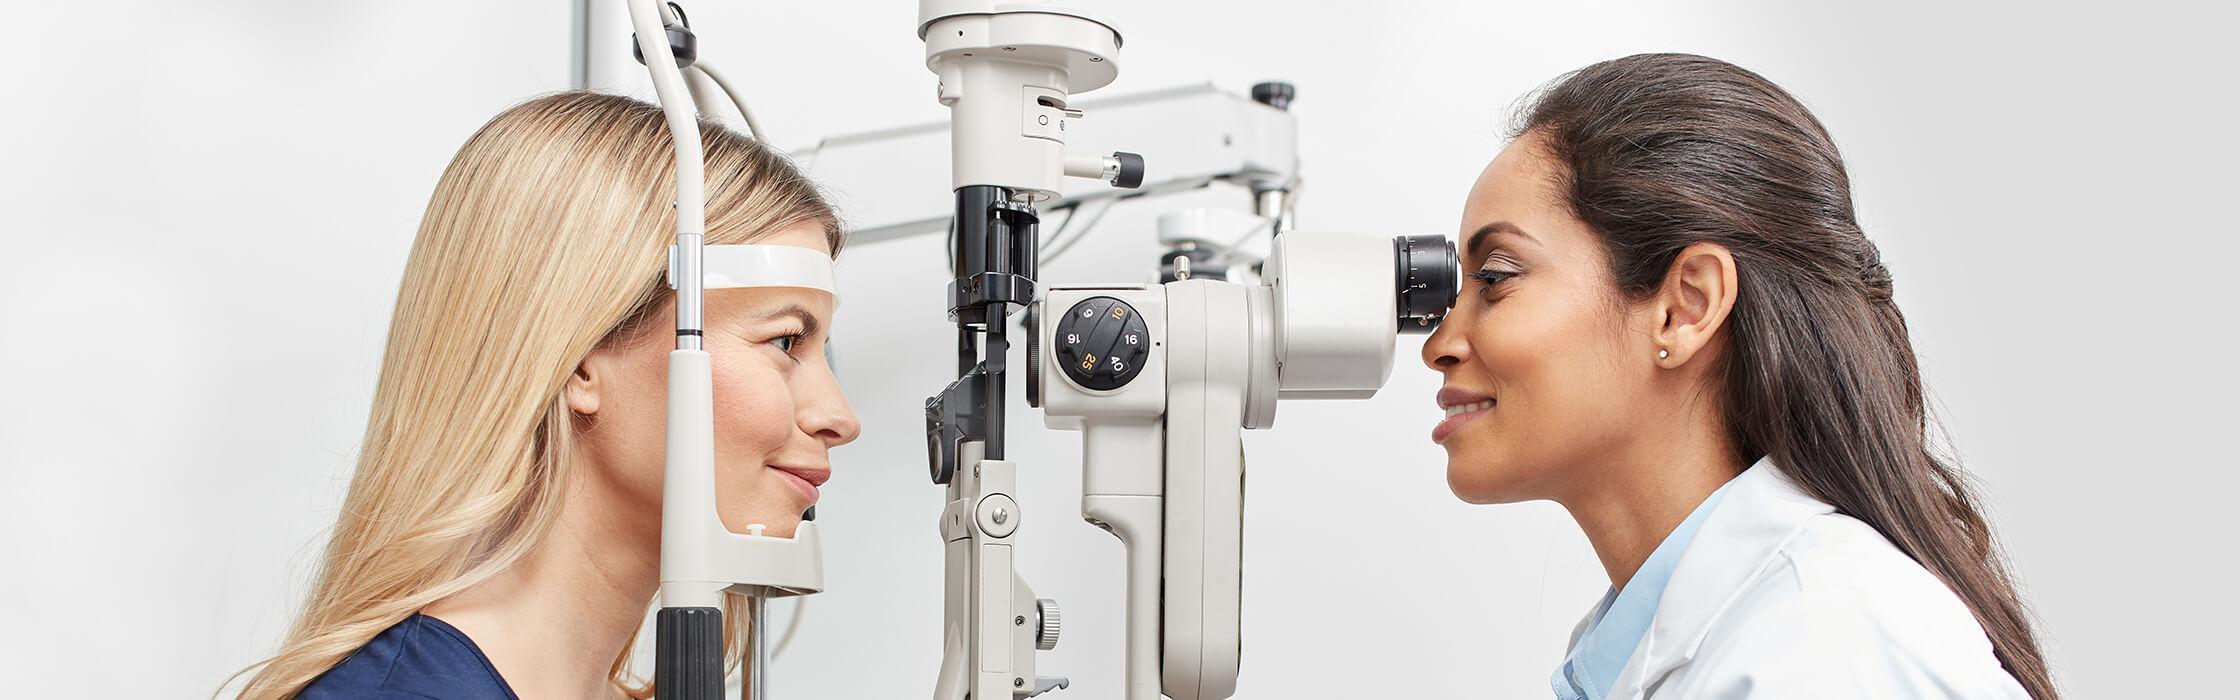 Optician and customer looking through a tonometer